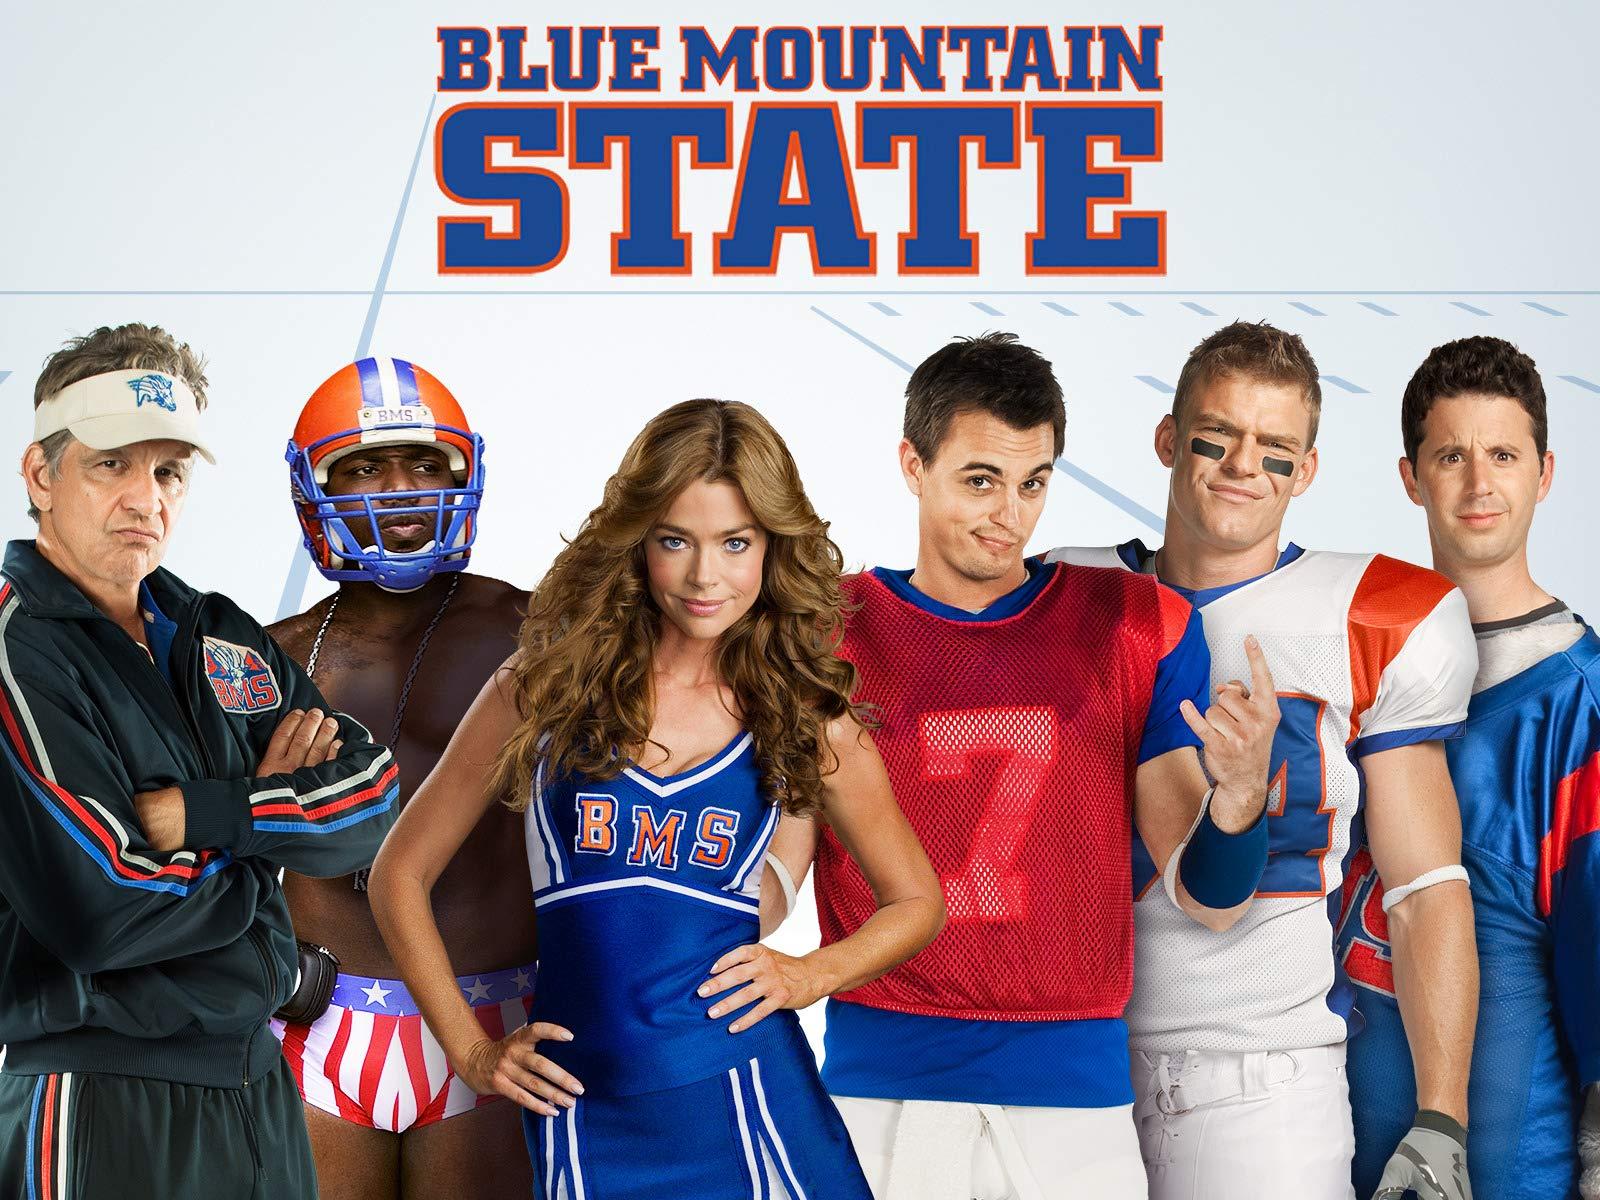 Blue Mountain State Netflix